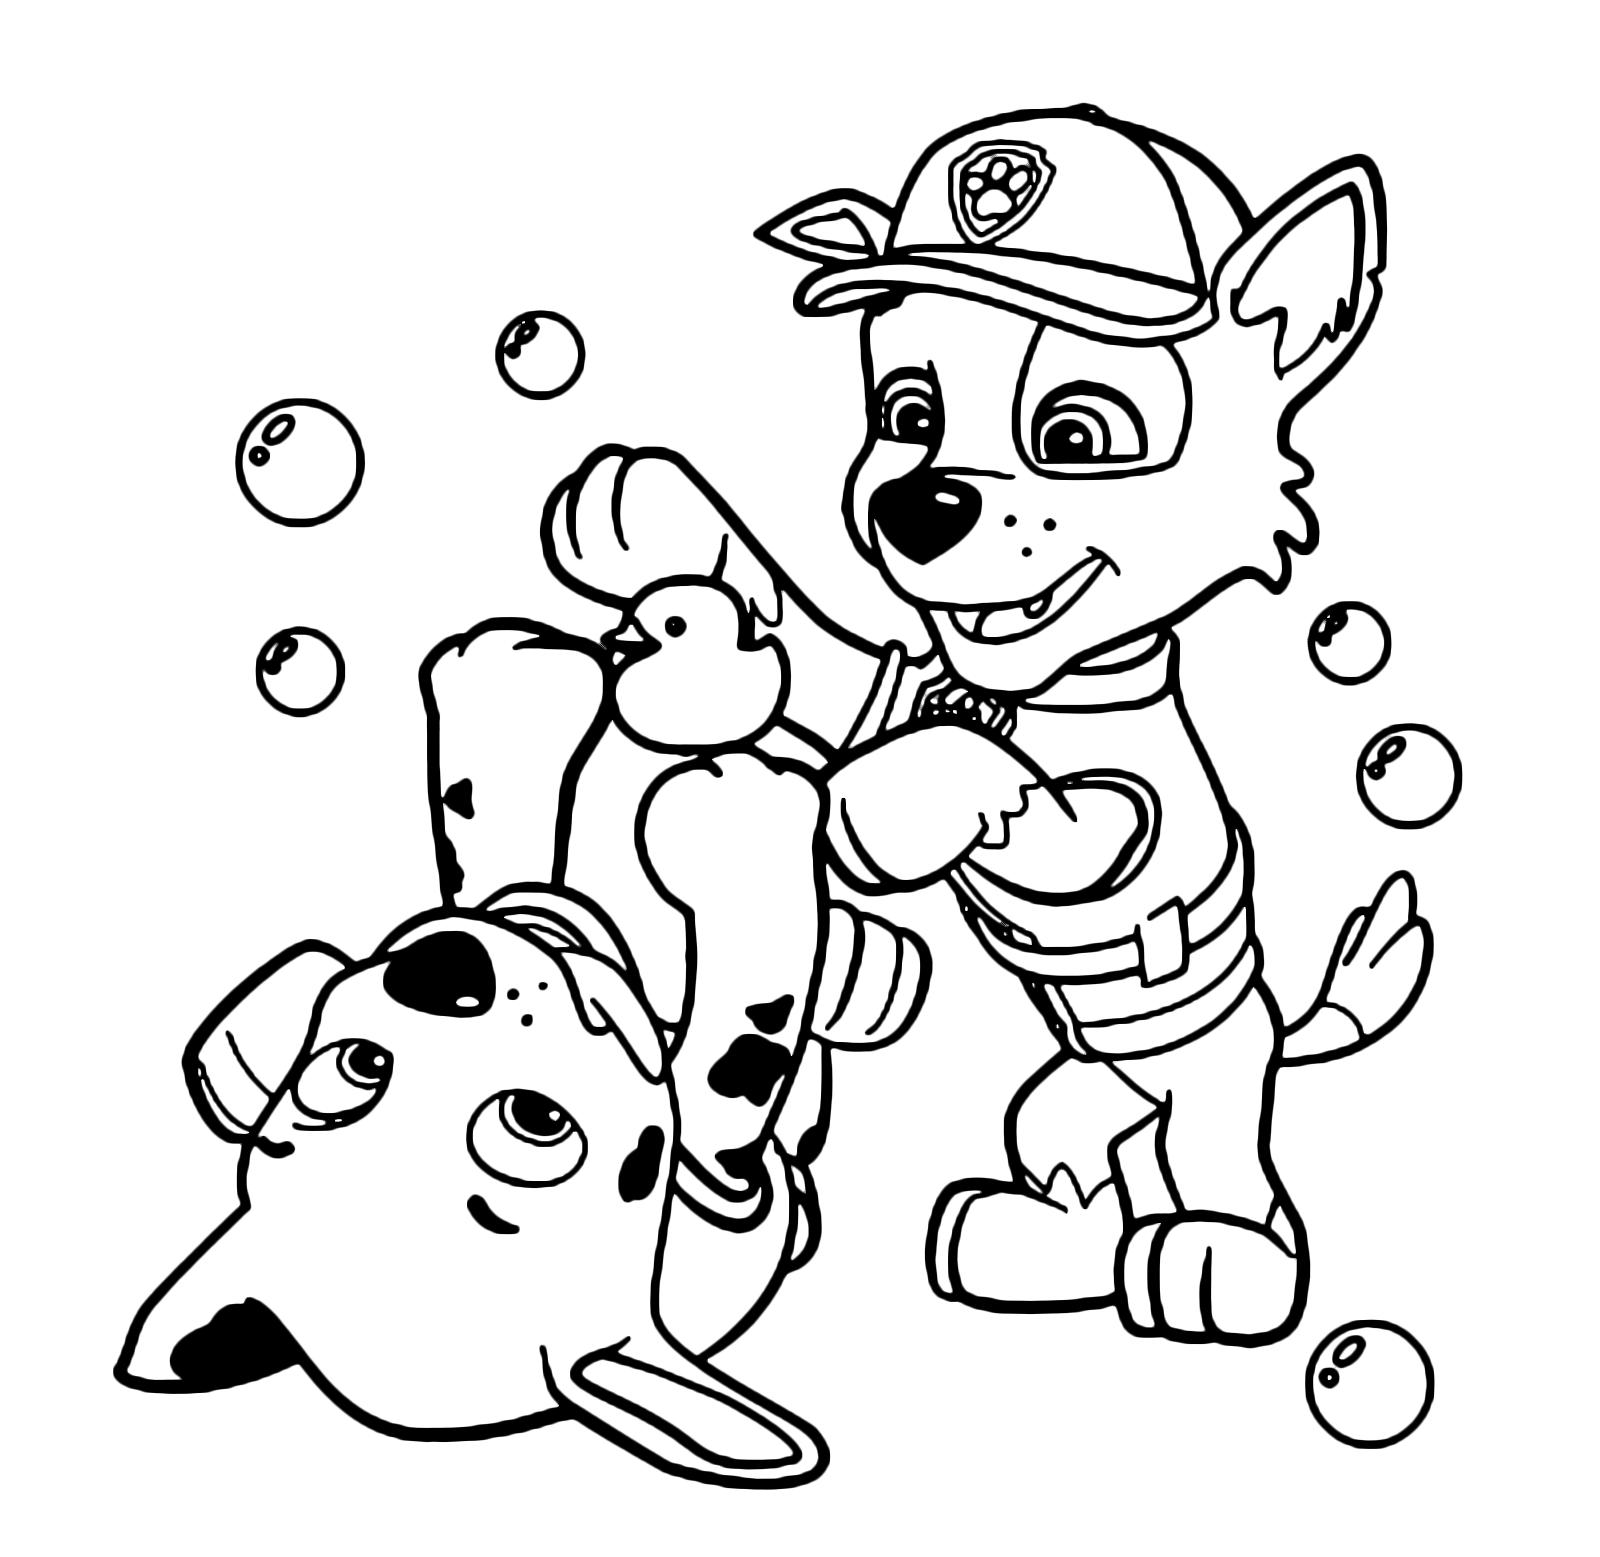 Paw patrol rocky e marshall giocano assieme for Disegni da colorare paw patrol